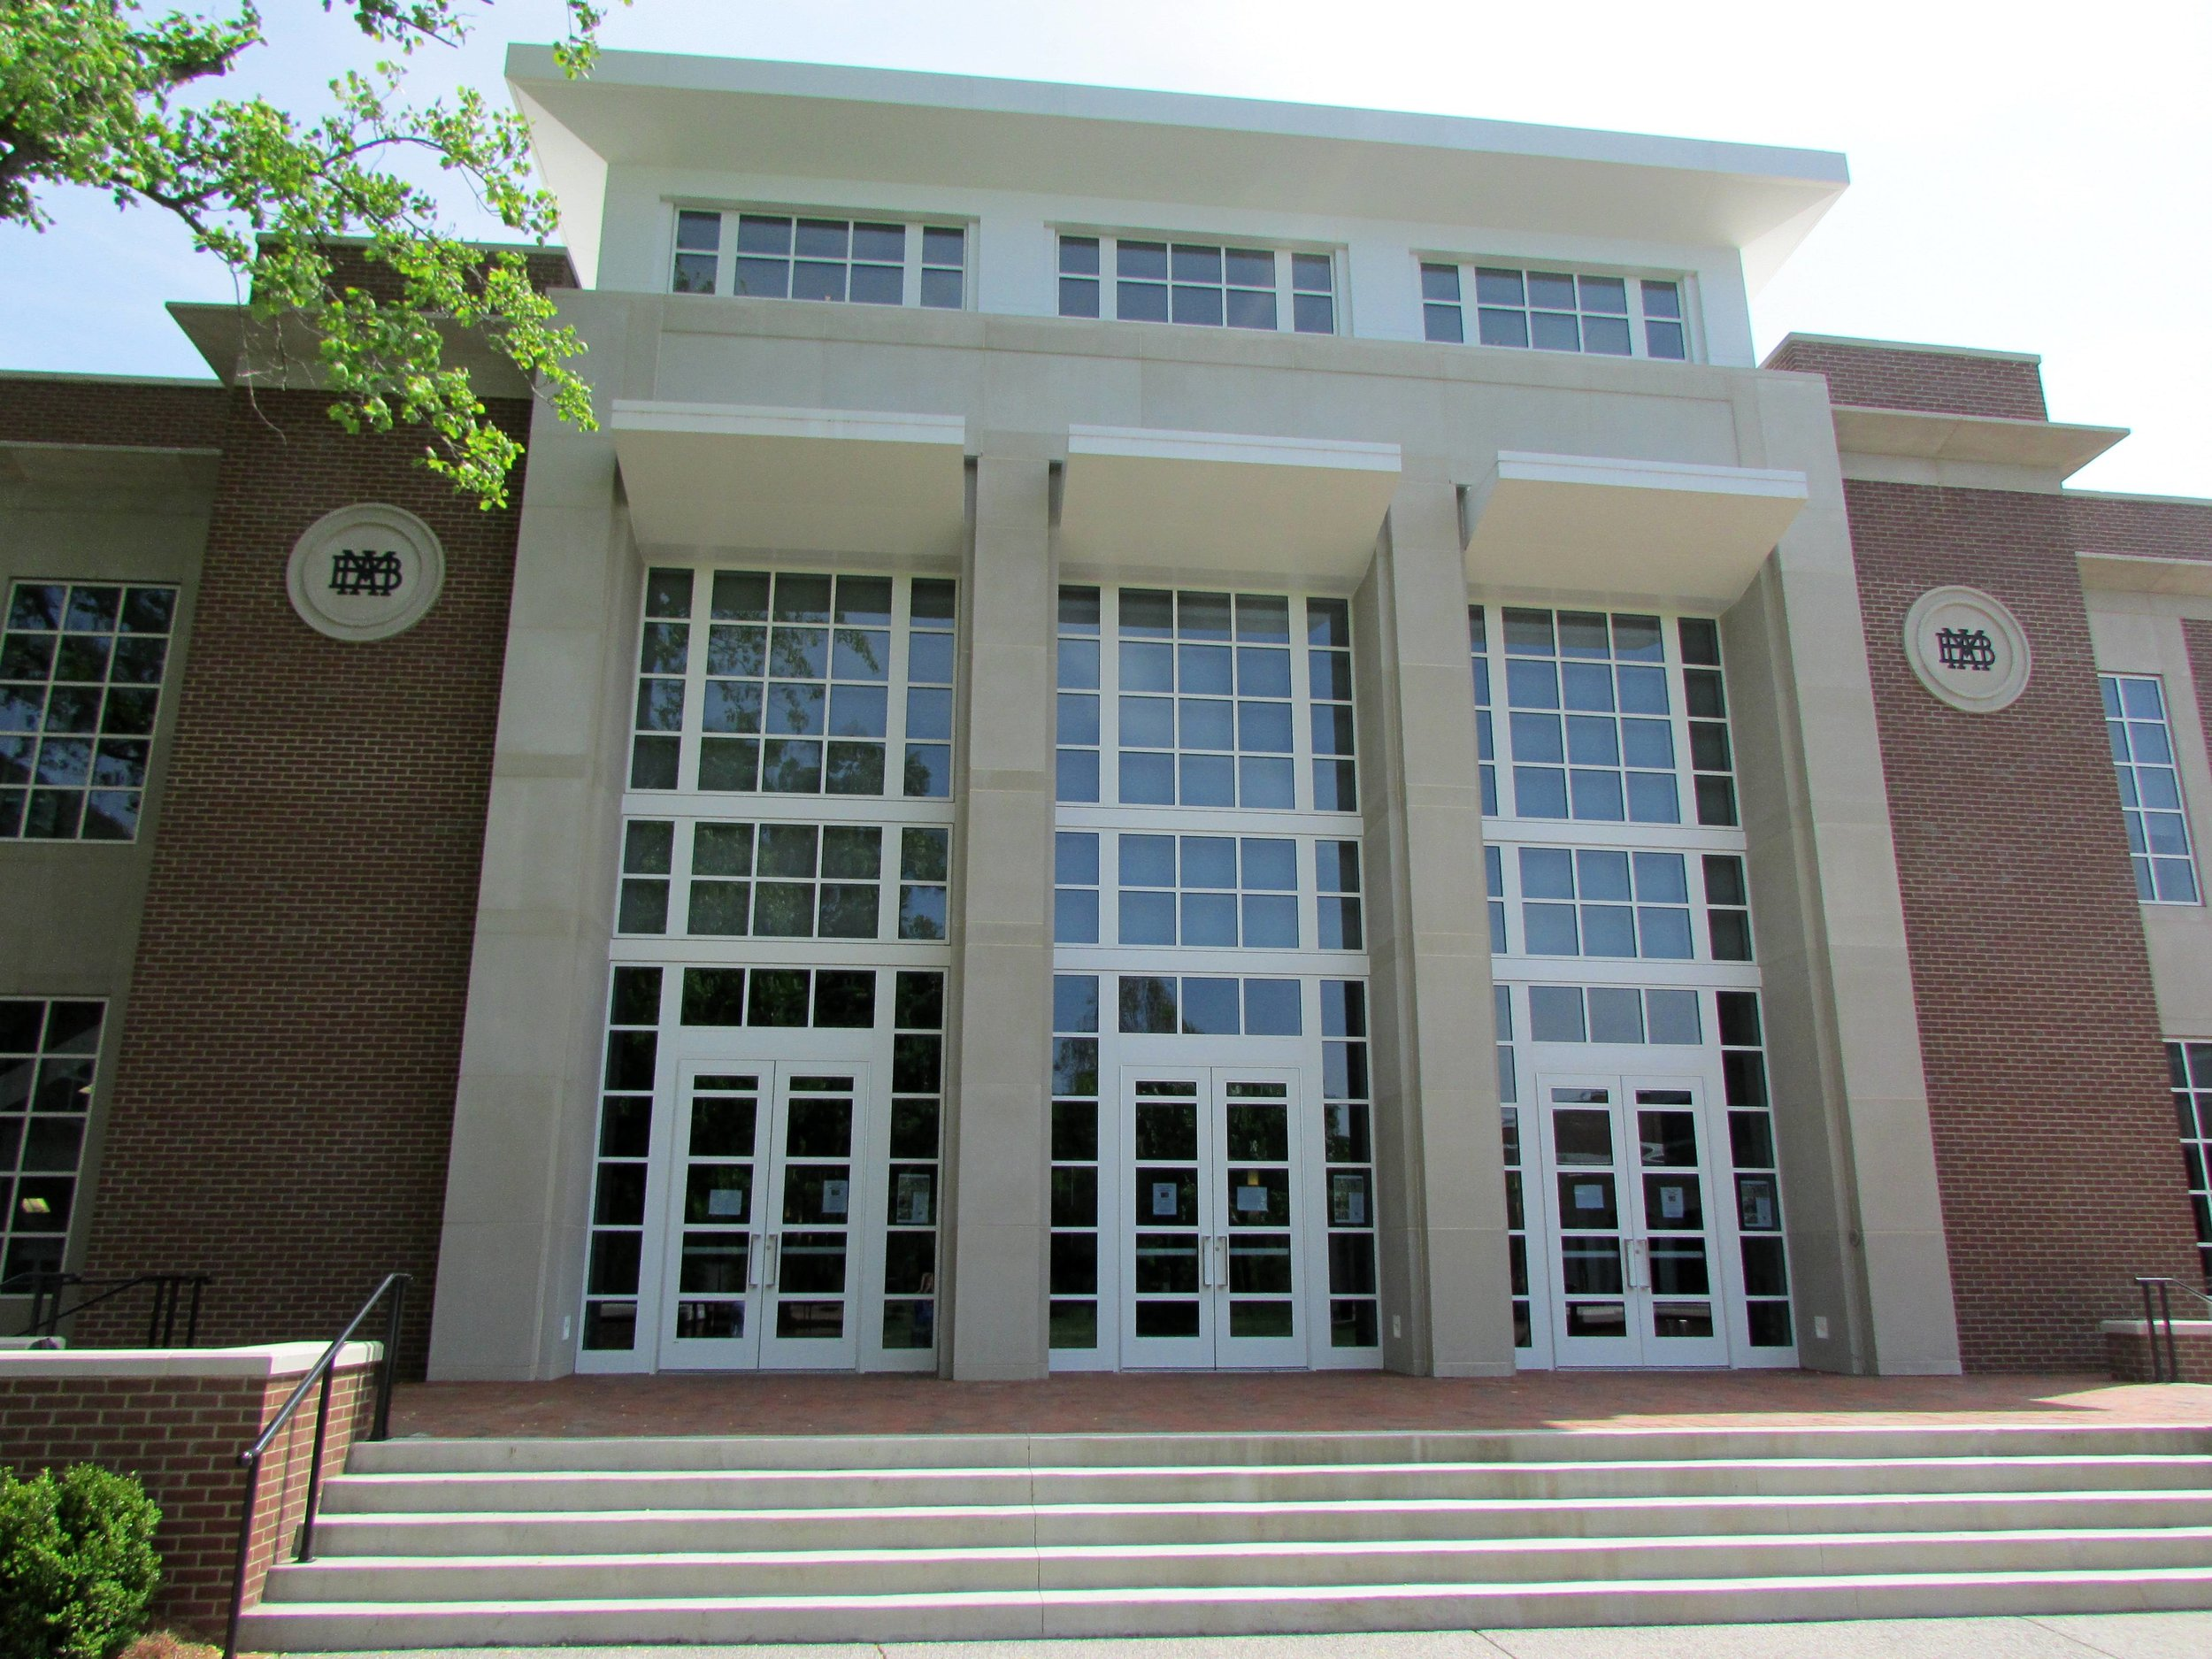 Montgomery Bell Academy in Nashville, Tennessee